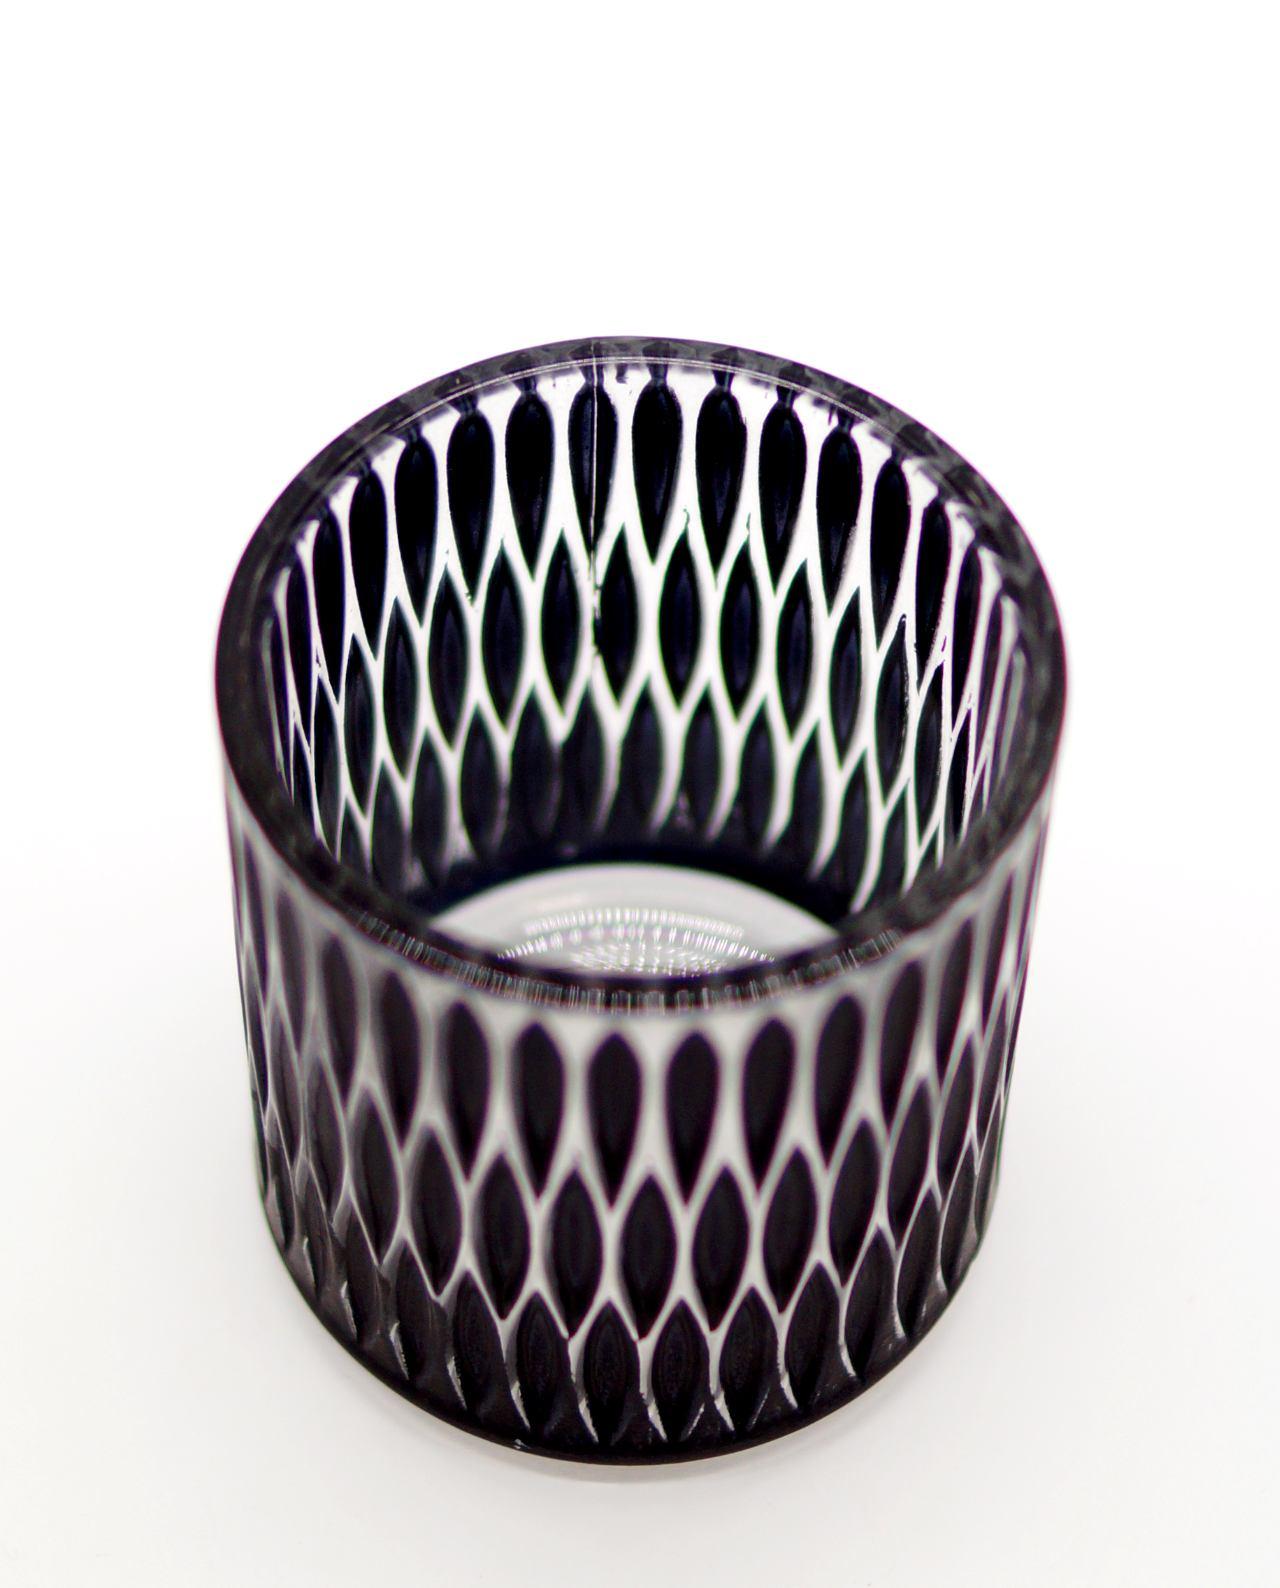 Votive of tealight black glass with pattern